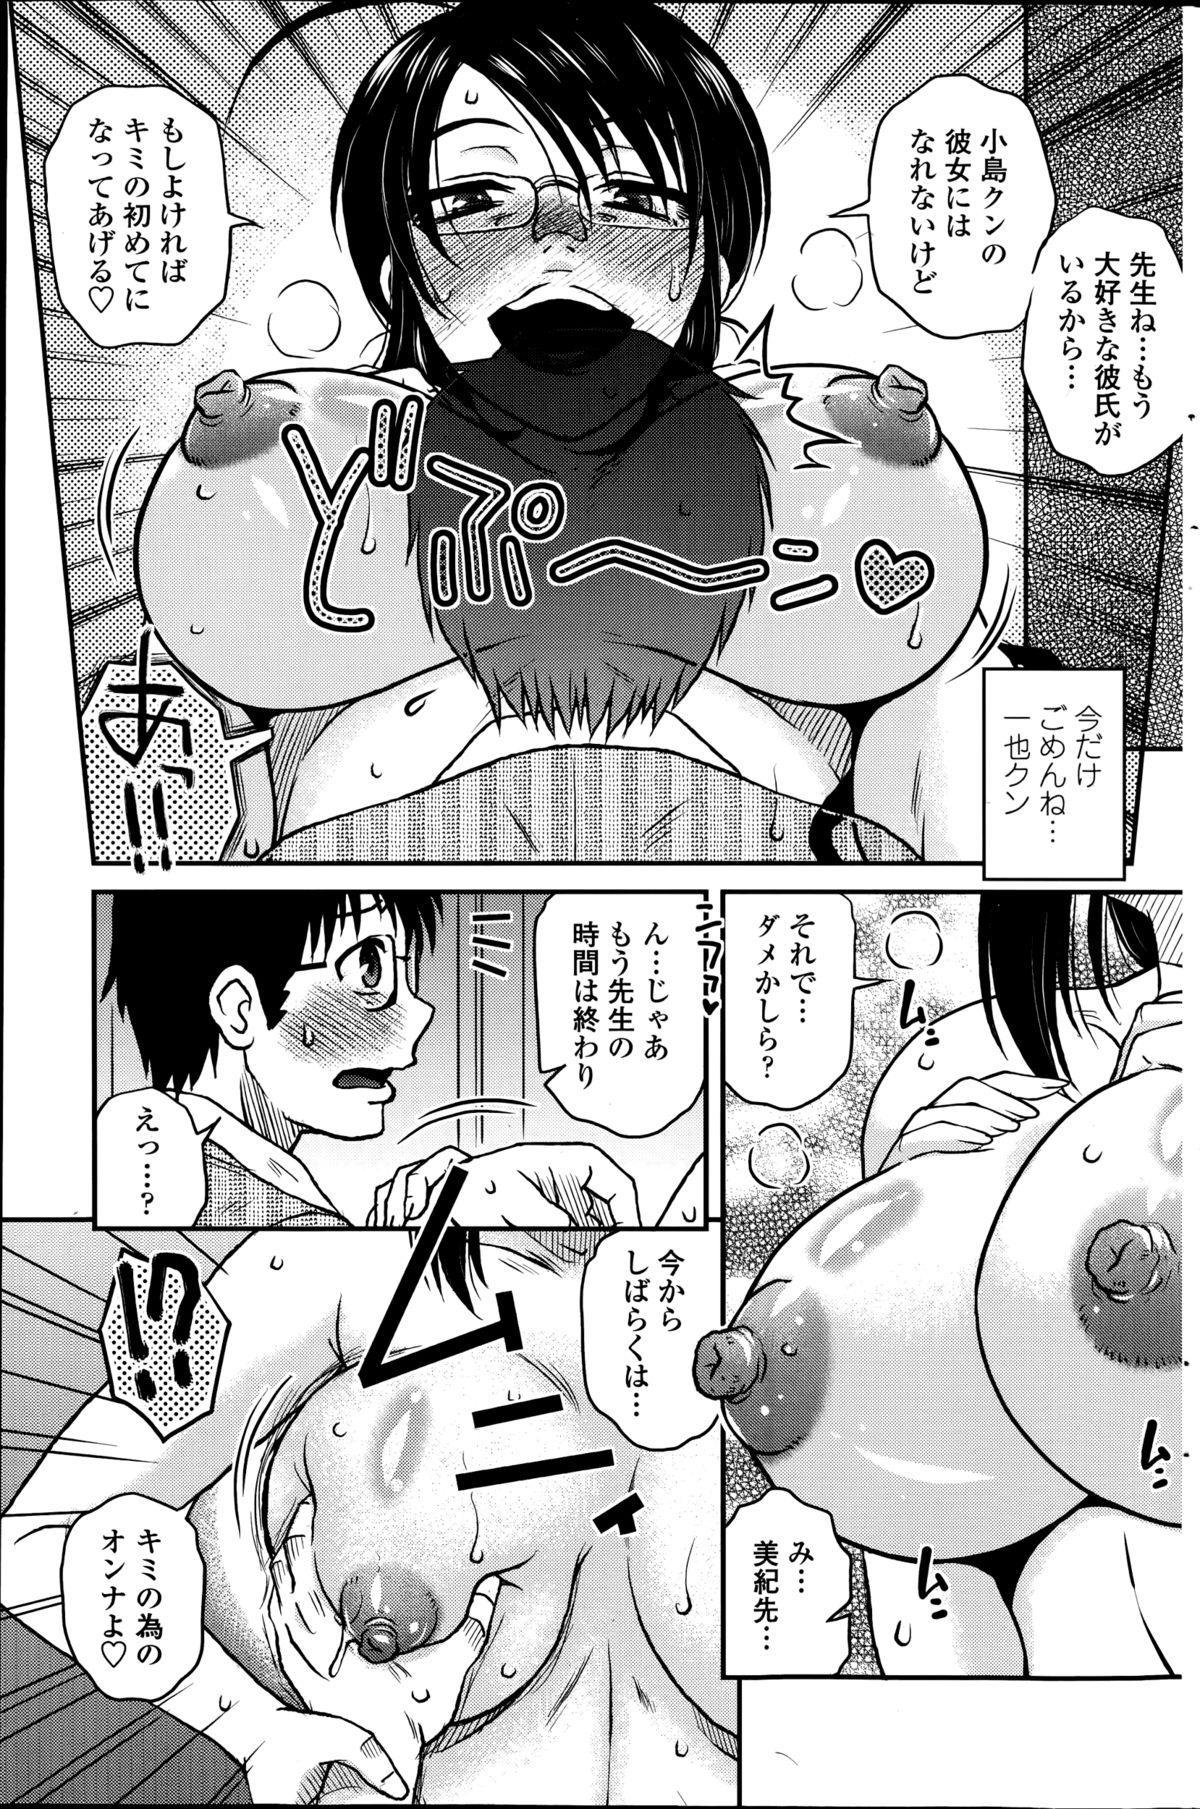 [Kurumiya Mashimin] Mikkai-chuu ni Tsuki Ch.1-6 44